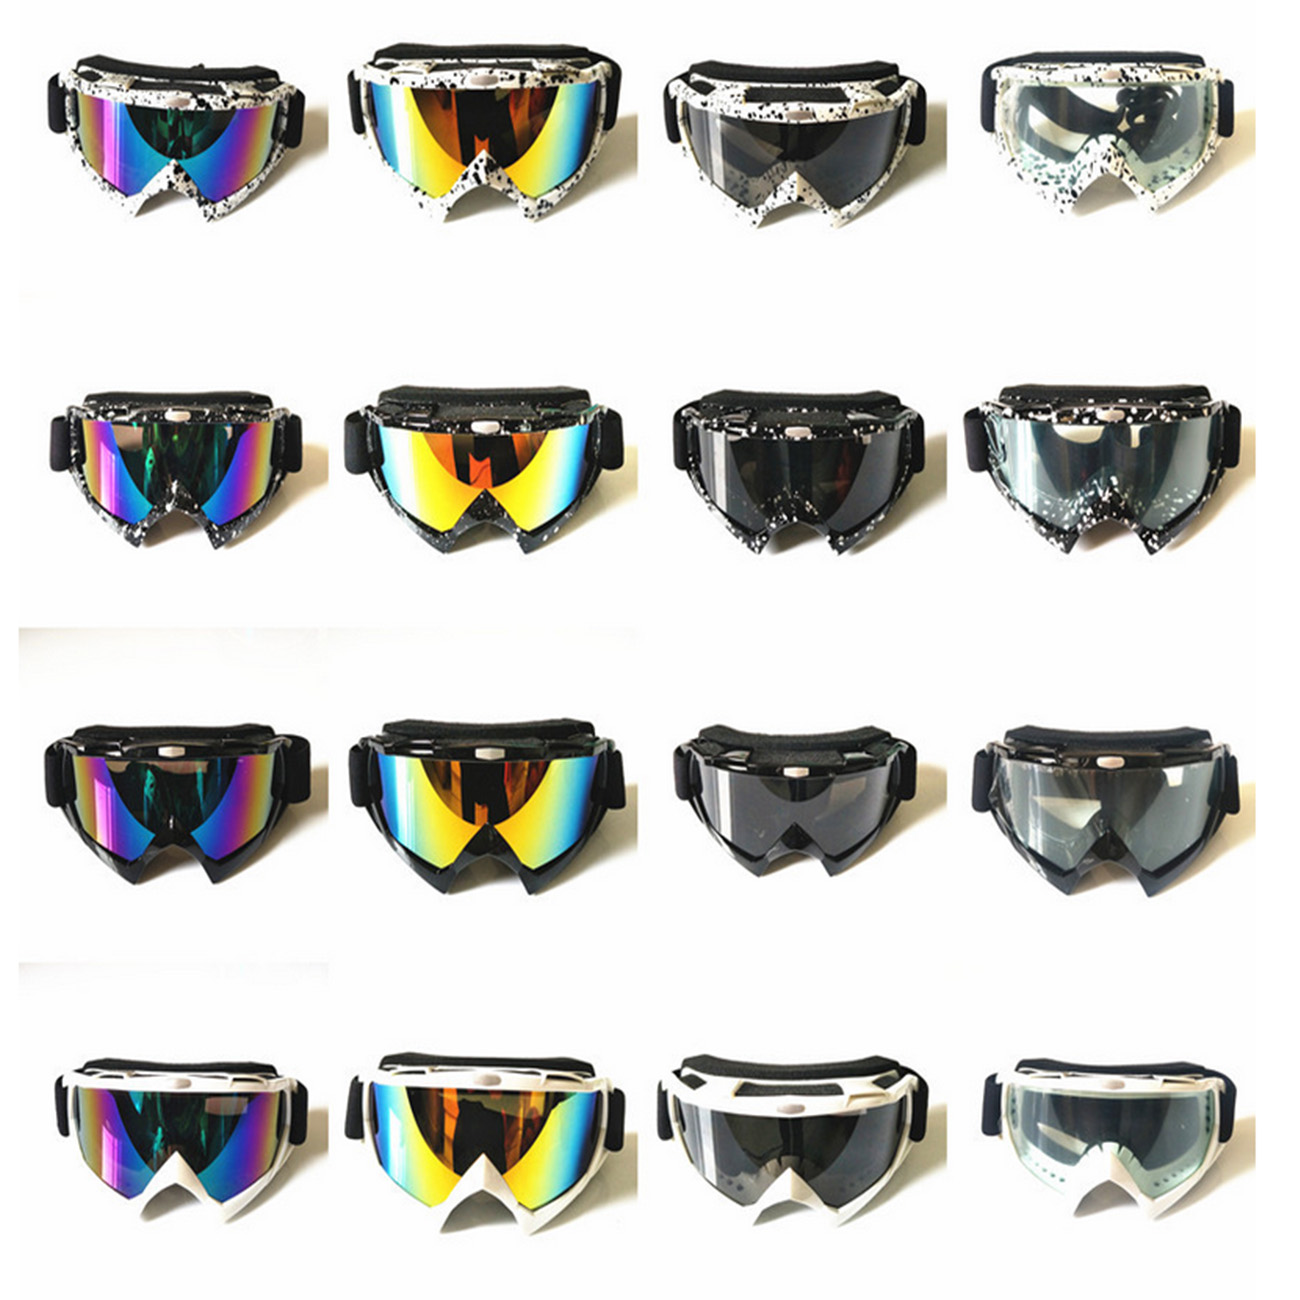 Enduro MX Goggles Motocross MTB Off-Road Dirt Riding ATV Bike Eyewear PSB